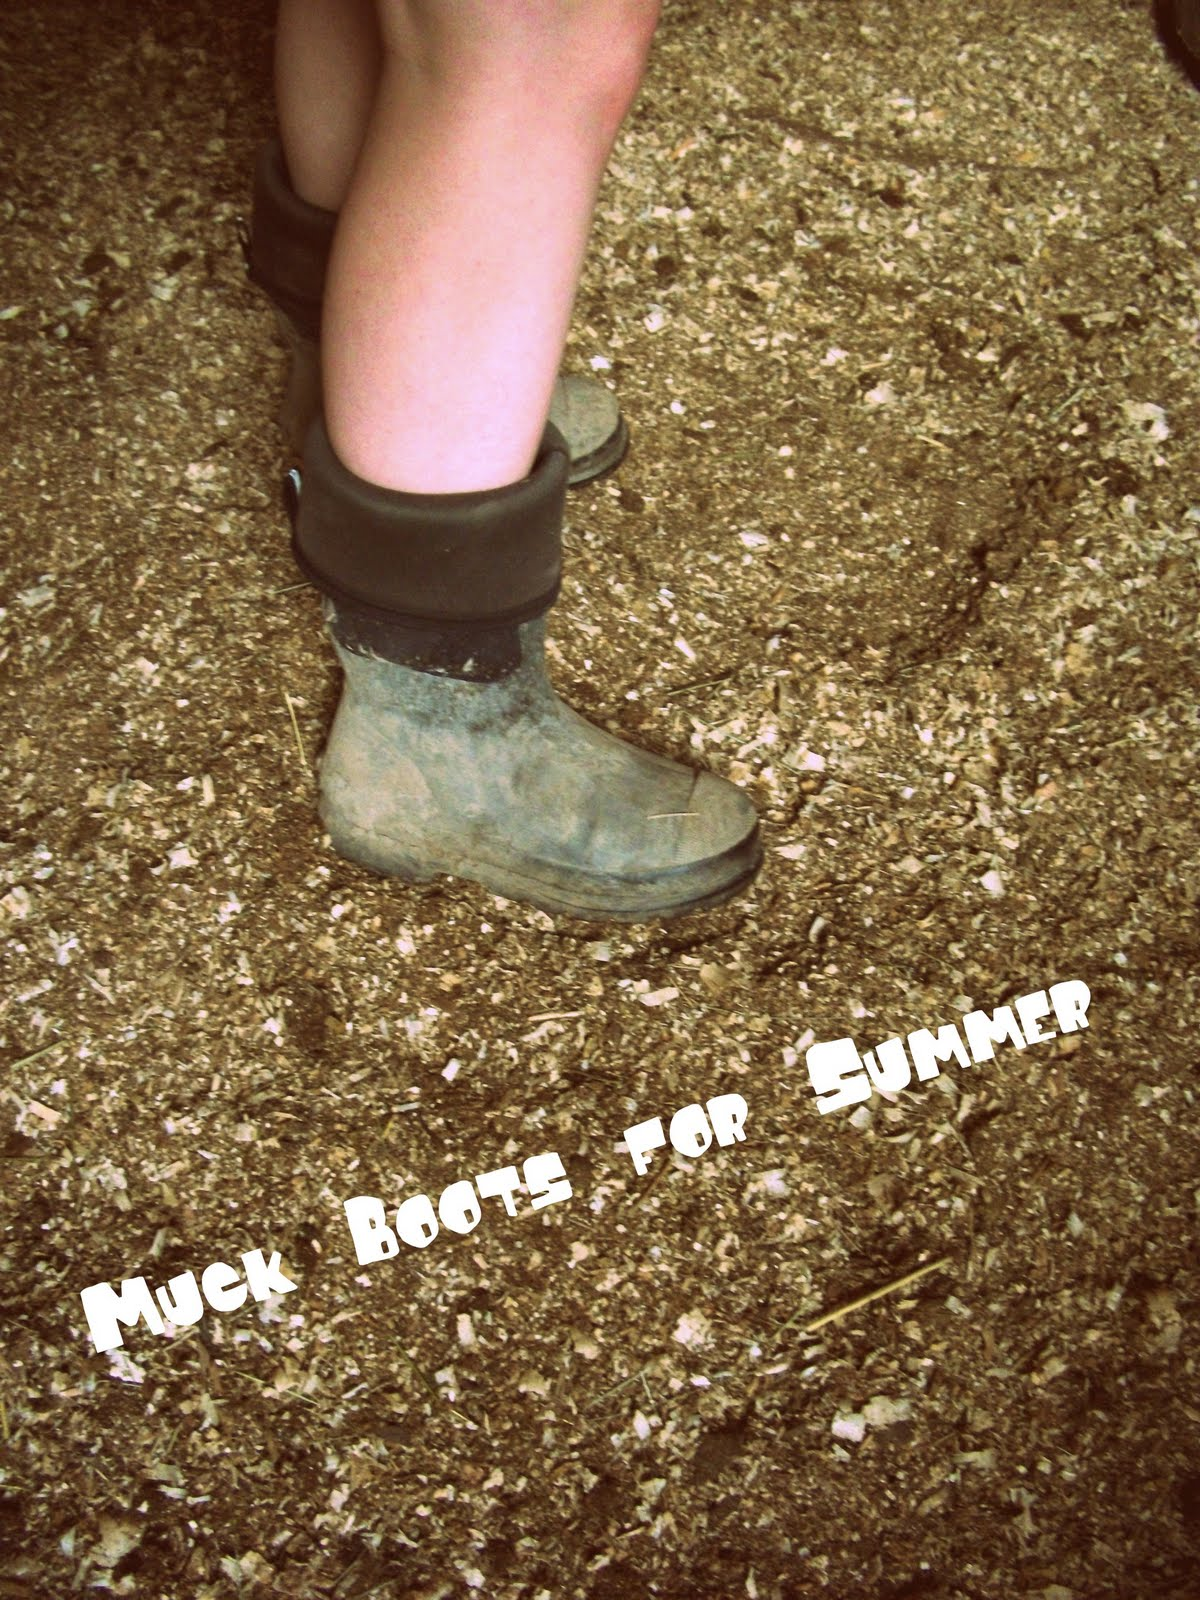 The Life of a Novice!: Farm Friday - Manure